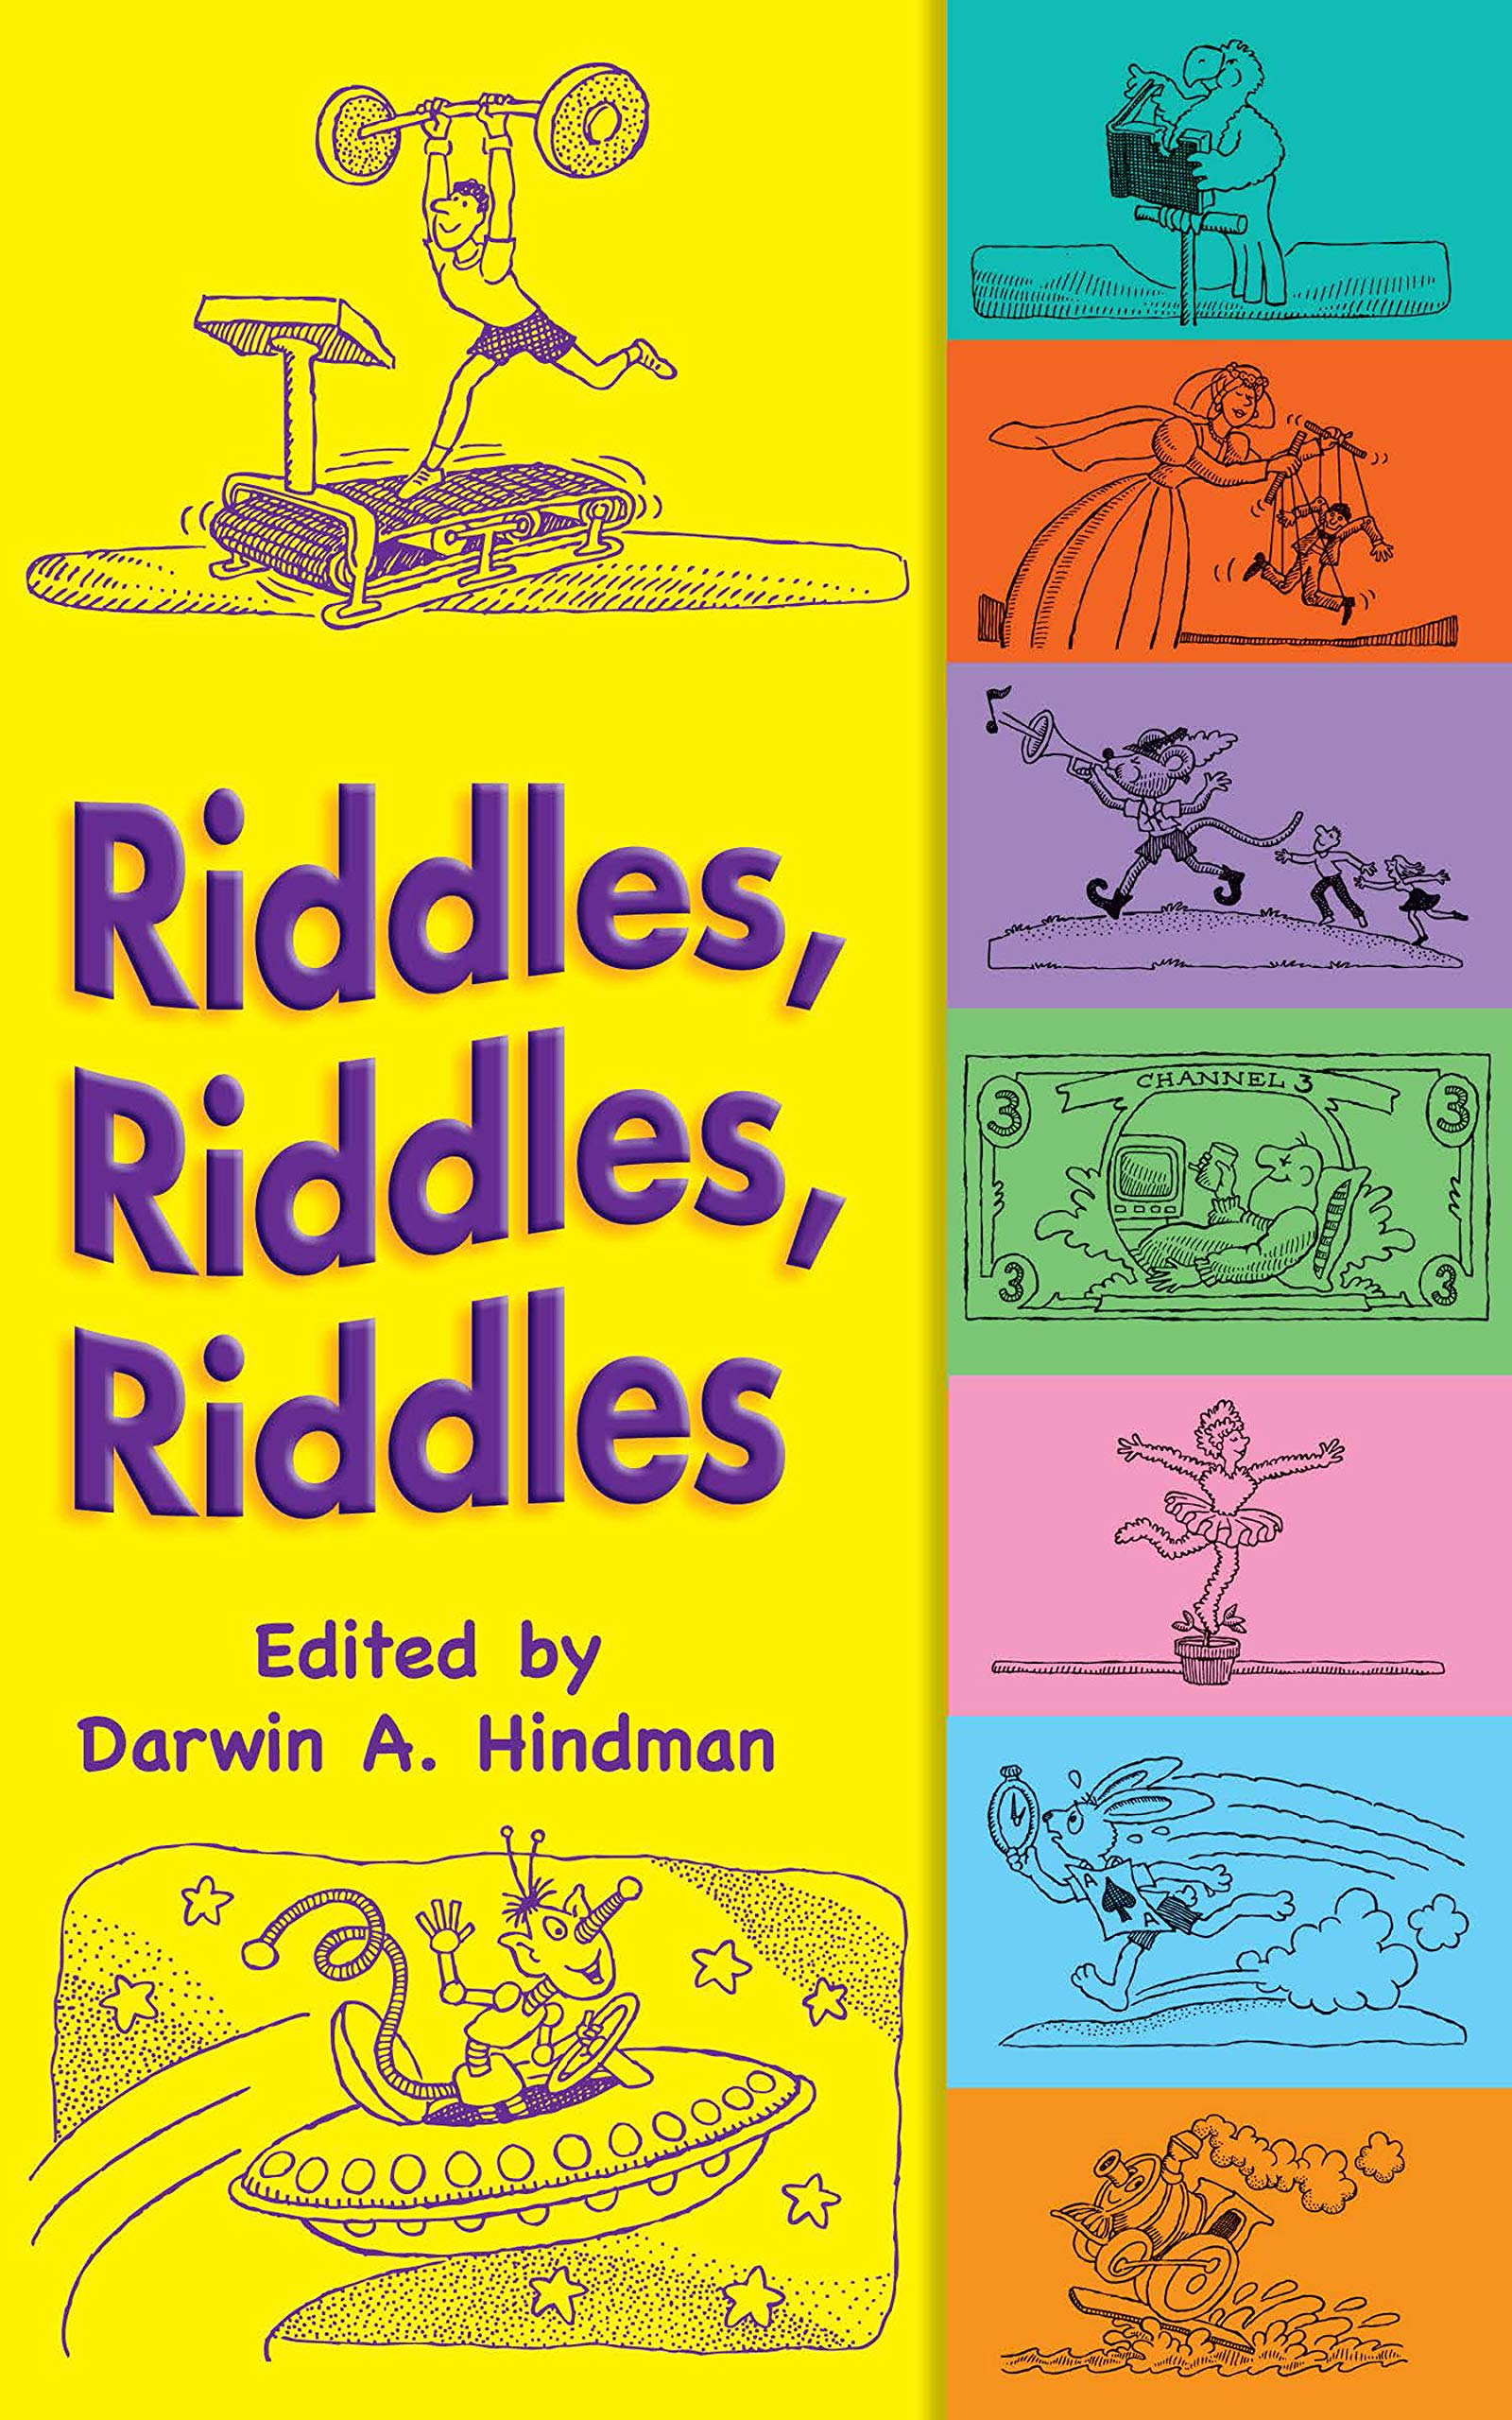 Amazon.com: Riddles, Riddles, Riddles (Dover Children's Activity Books)  (9780486296548): Darwin A. Hindman: Books